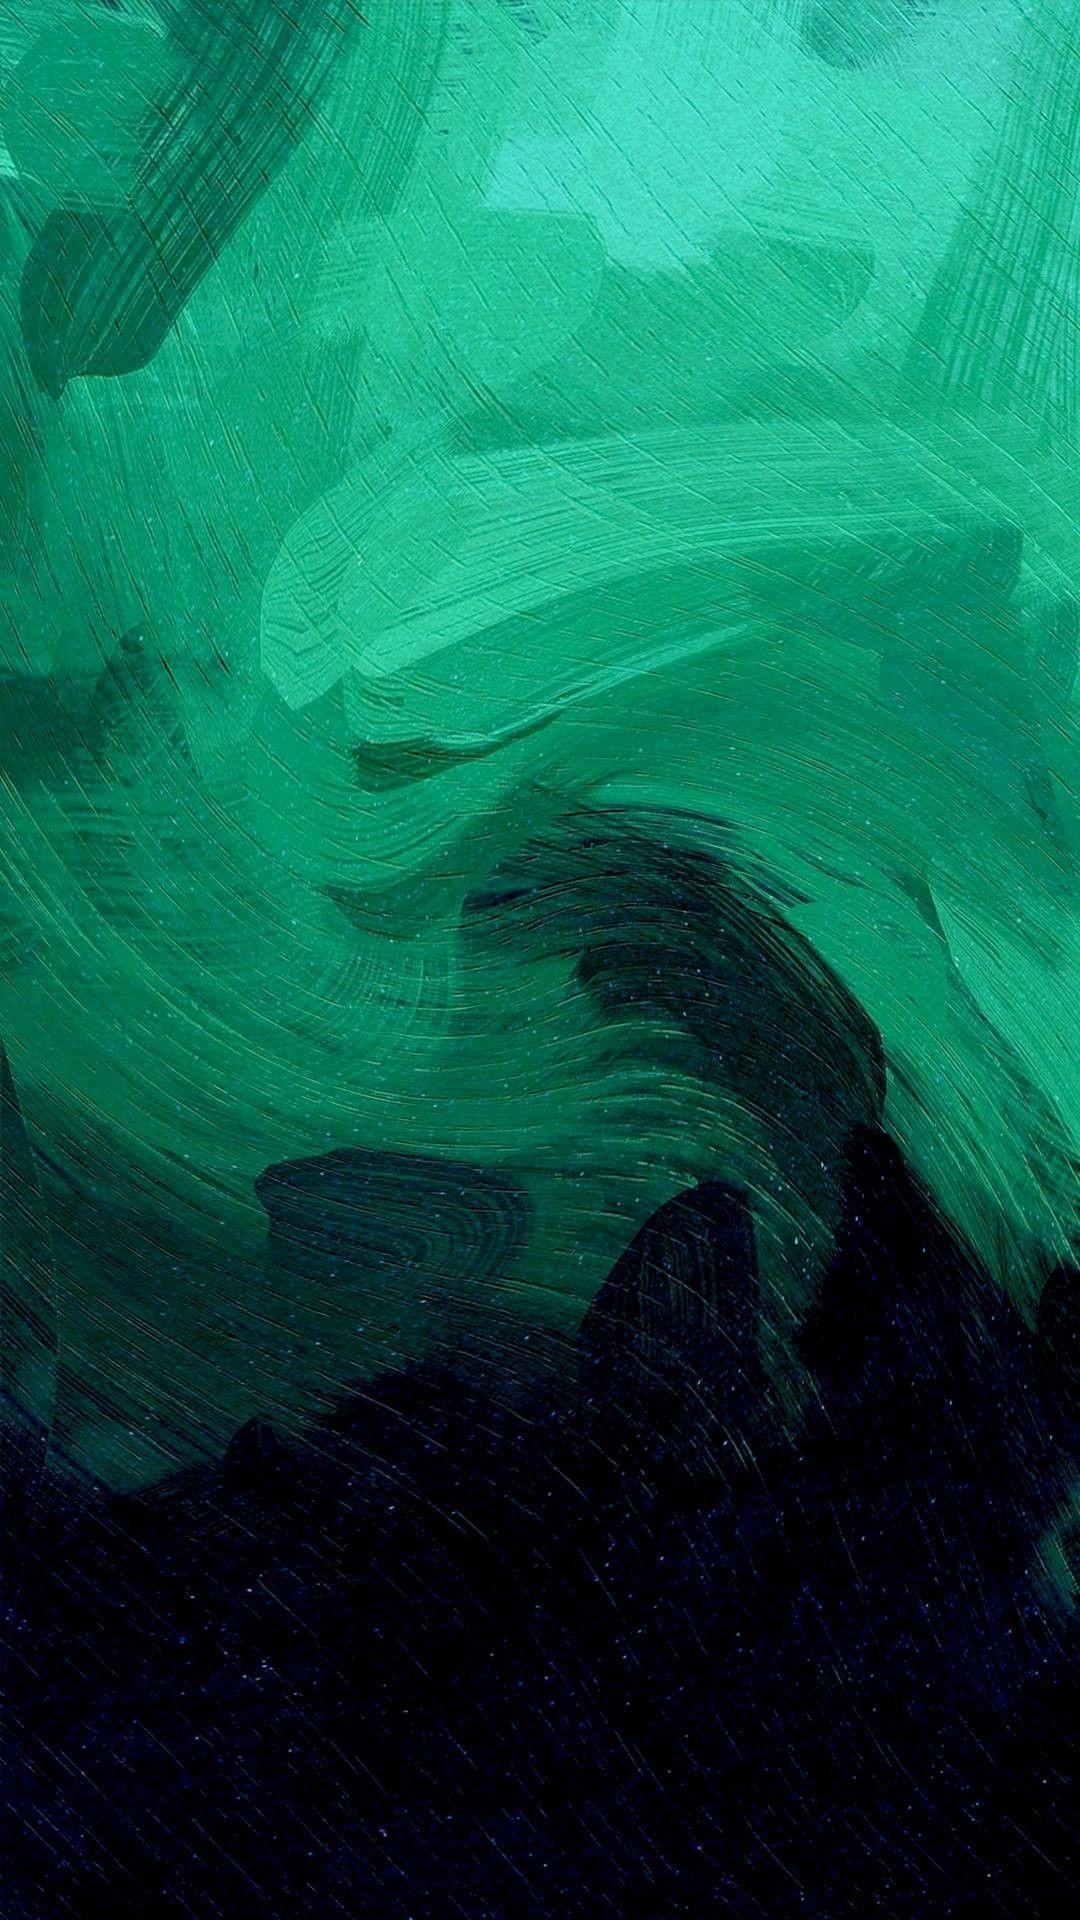 Pin by Parkerdavidson on Green aesthetic | Dark green ...